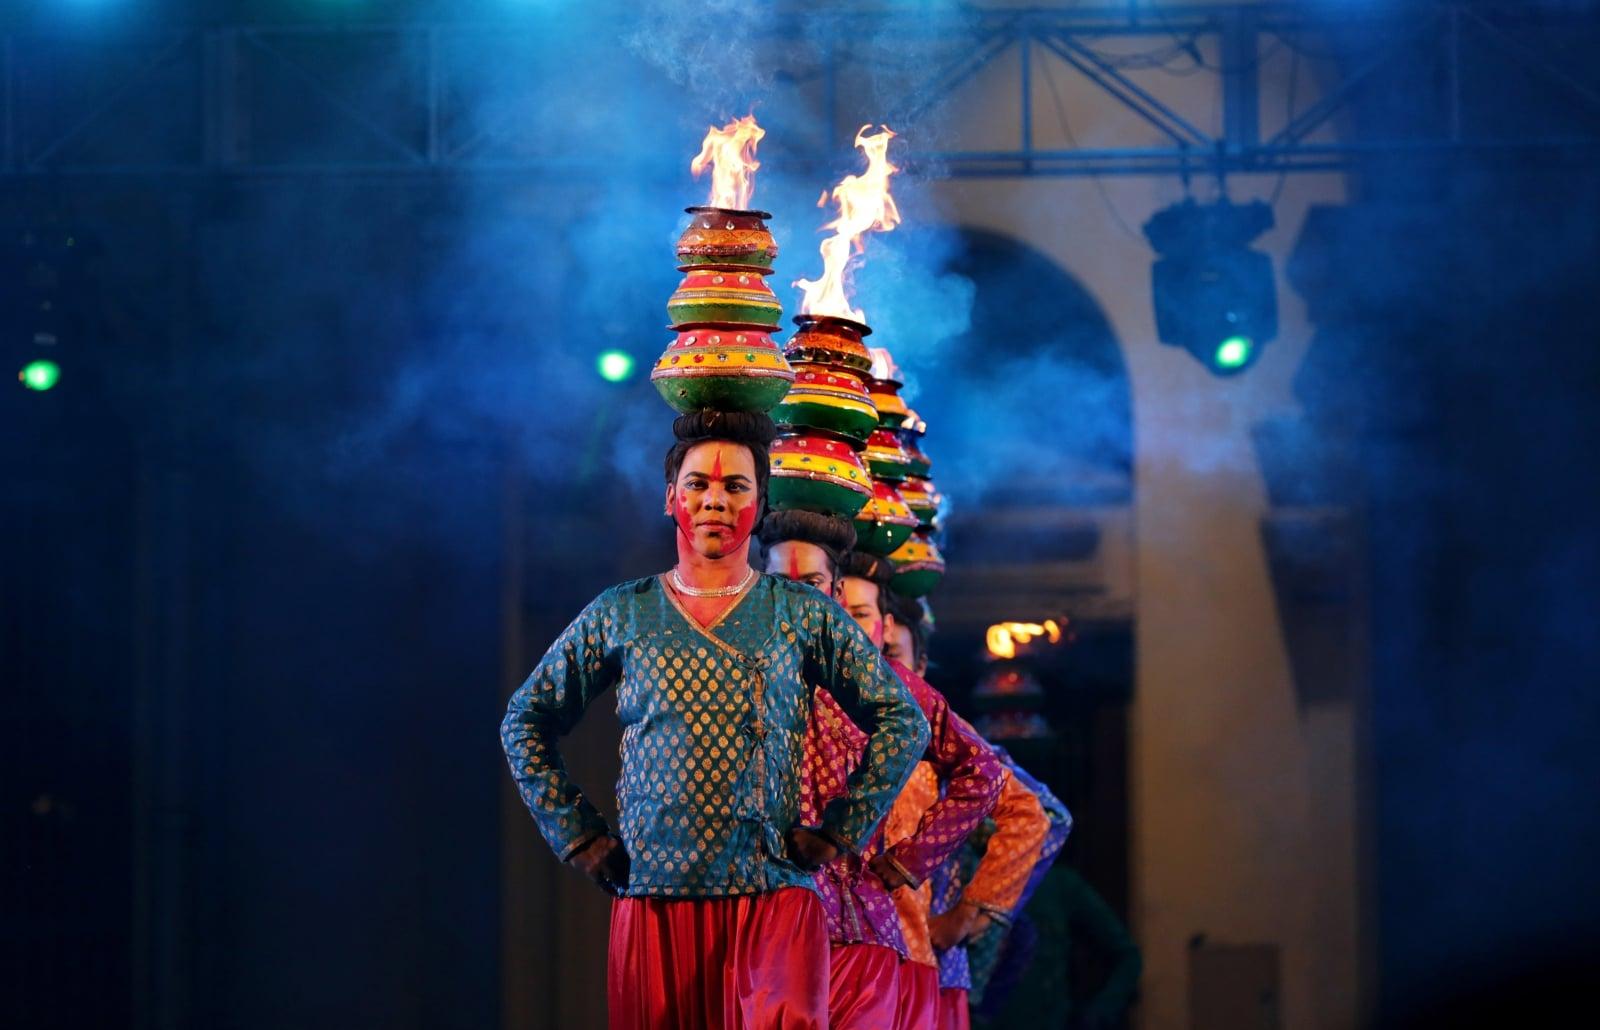 Święto w Indiach fot. EPA/PIYAL ADHIKARY